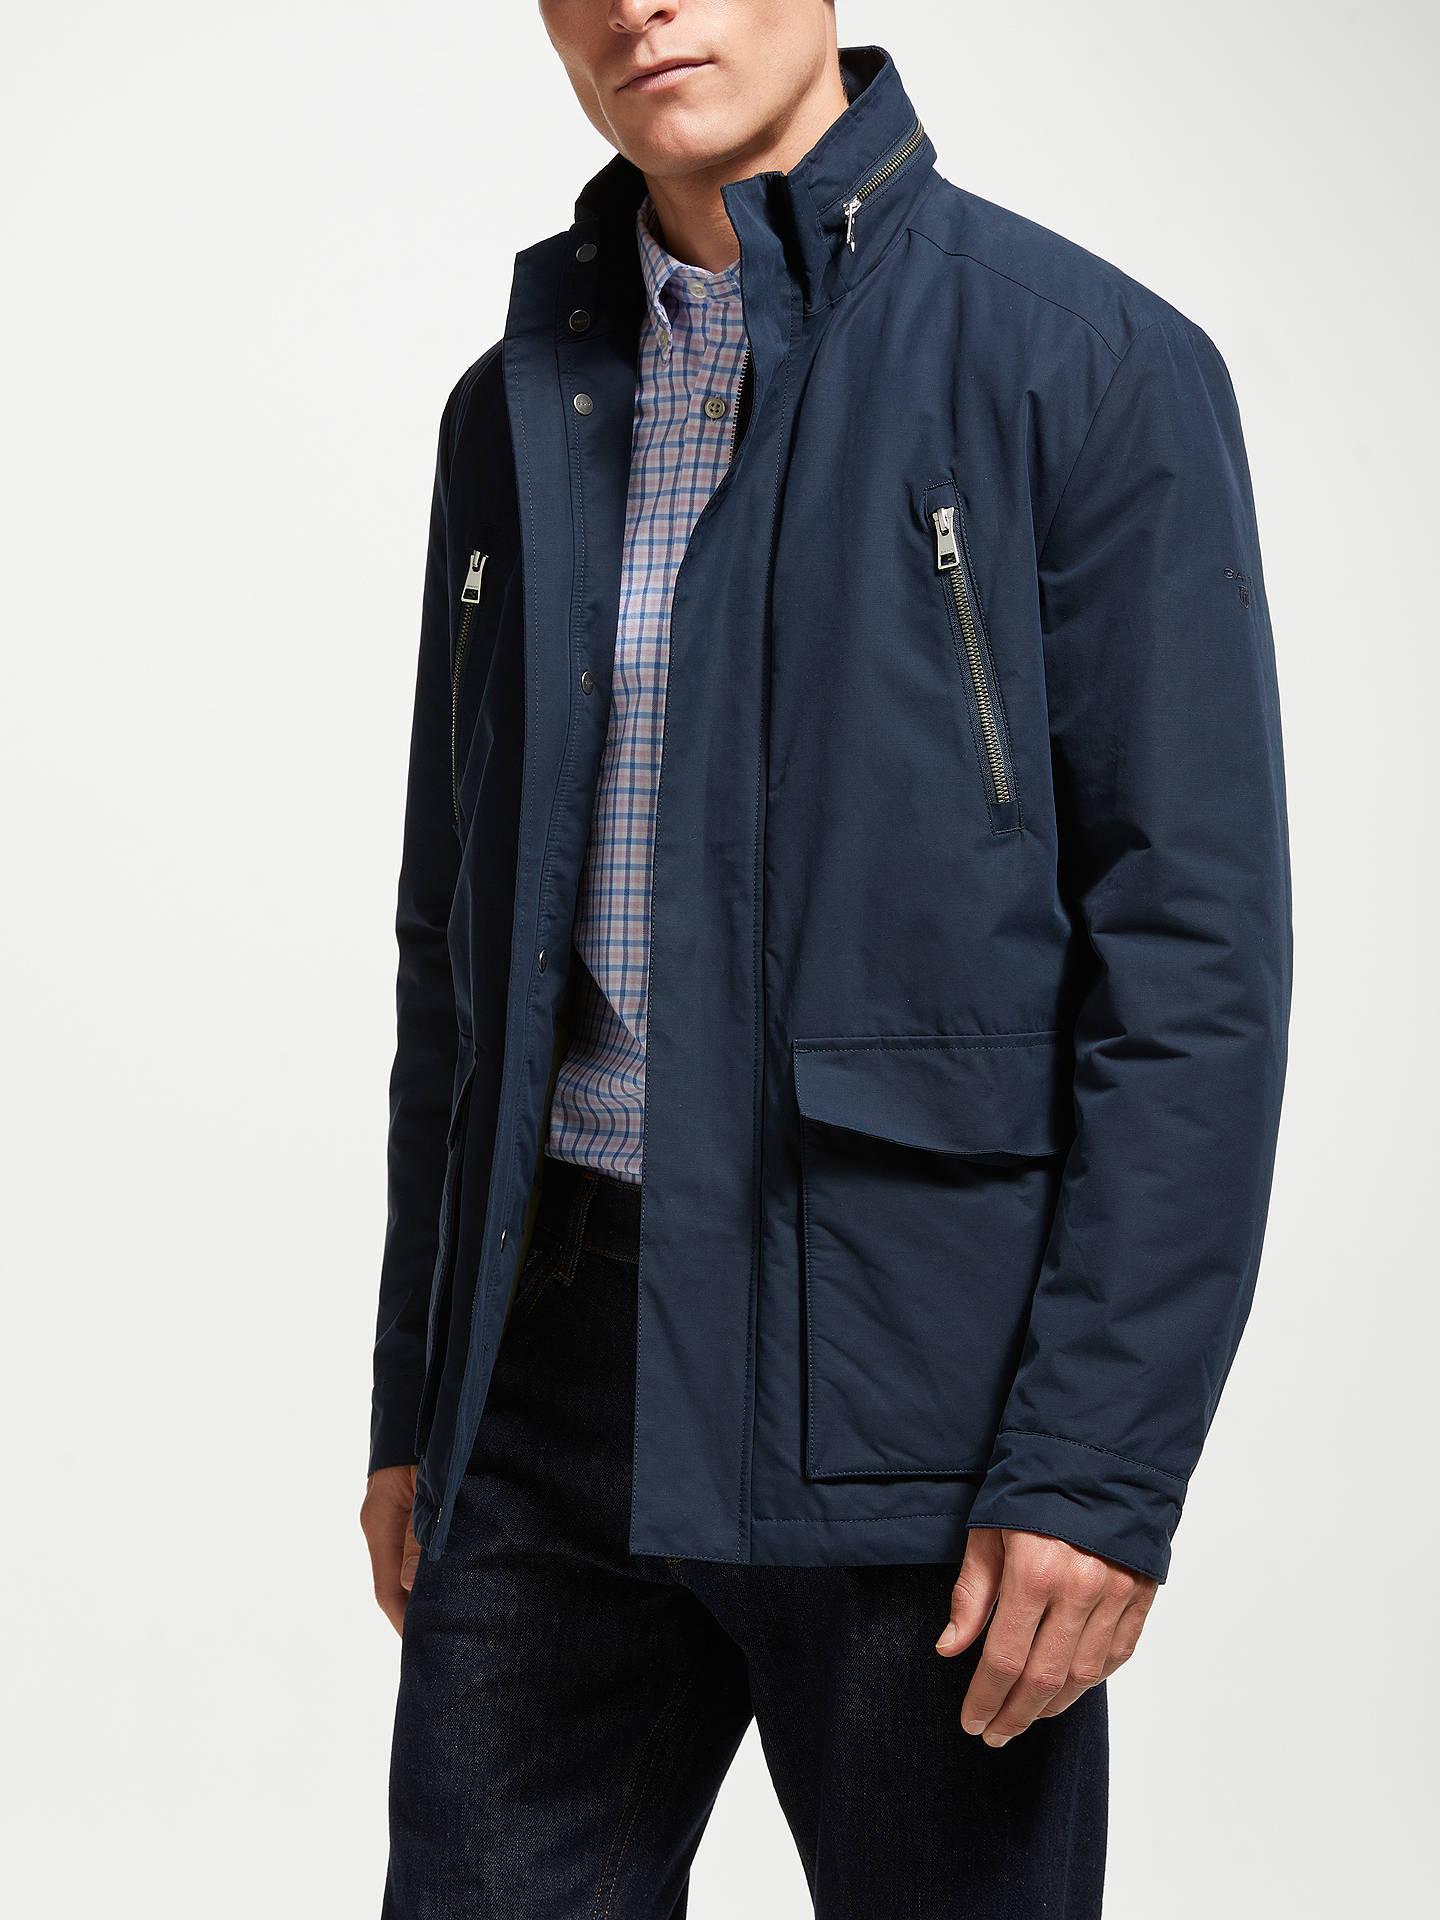 GANT Avenue Zip Hood Jacket, Blue 405 at John Lewis & Partners